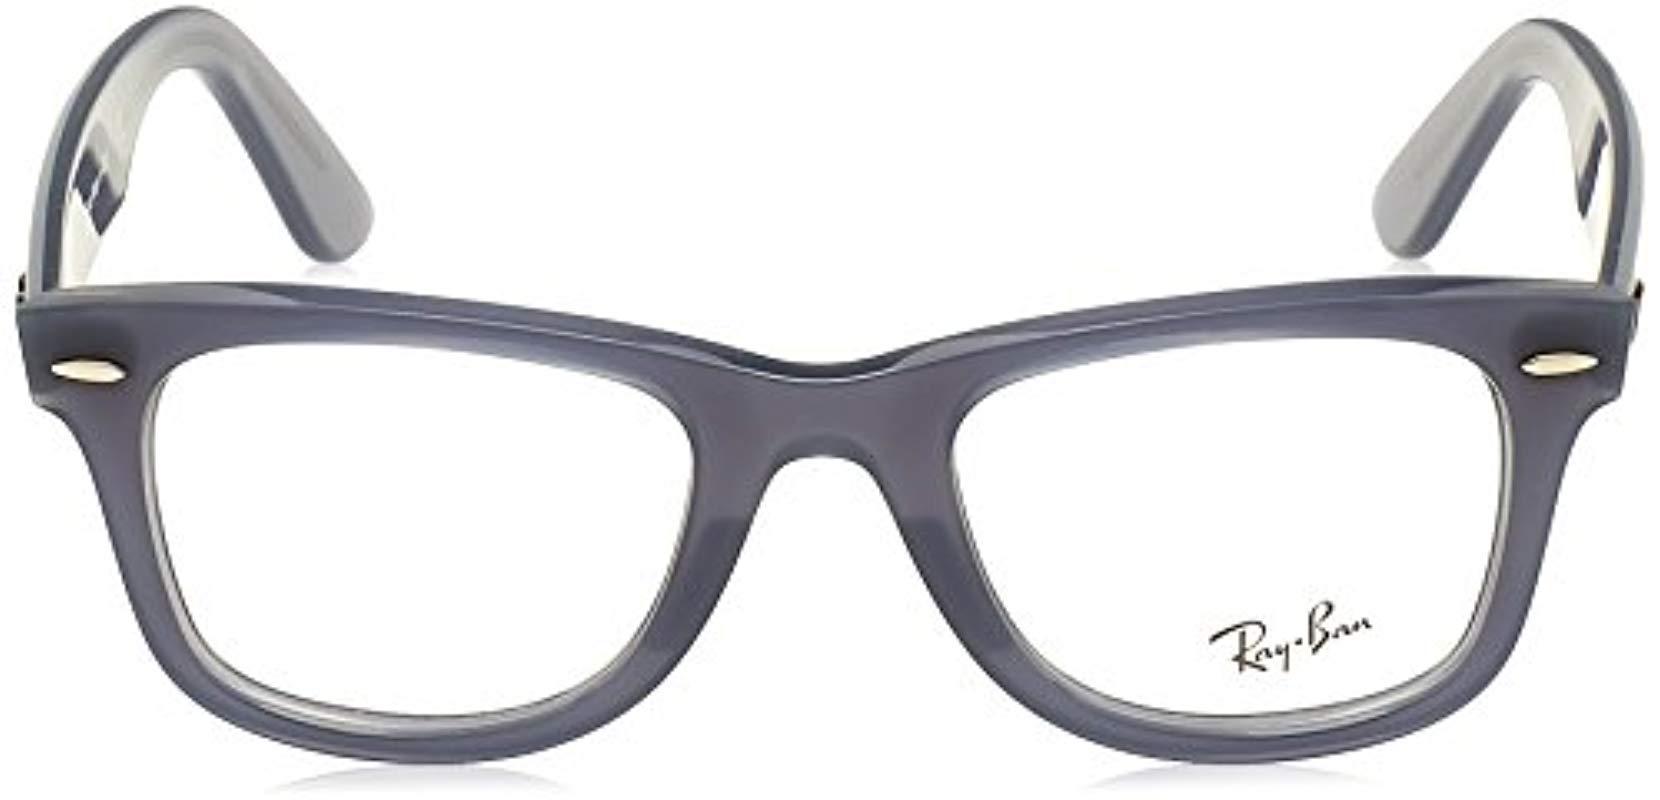 076a2979033 Ray-Ban Unisex-adults 4340v Optical Frames